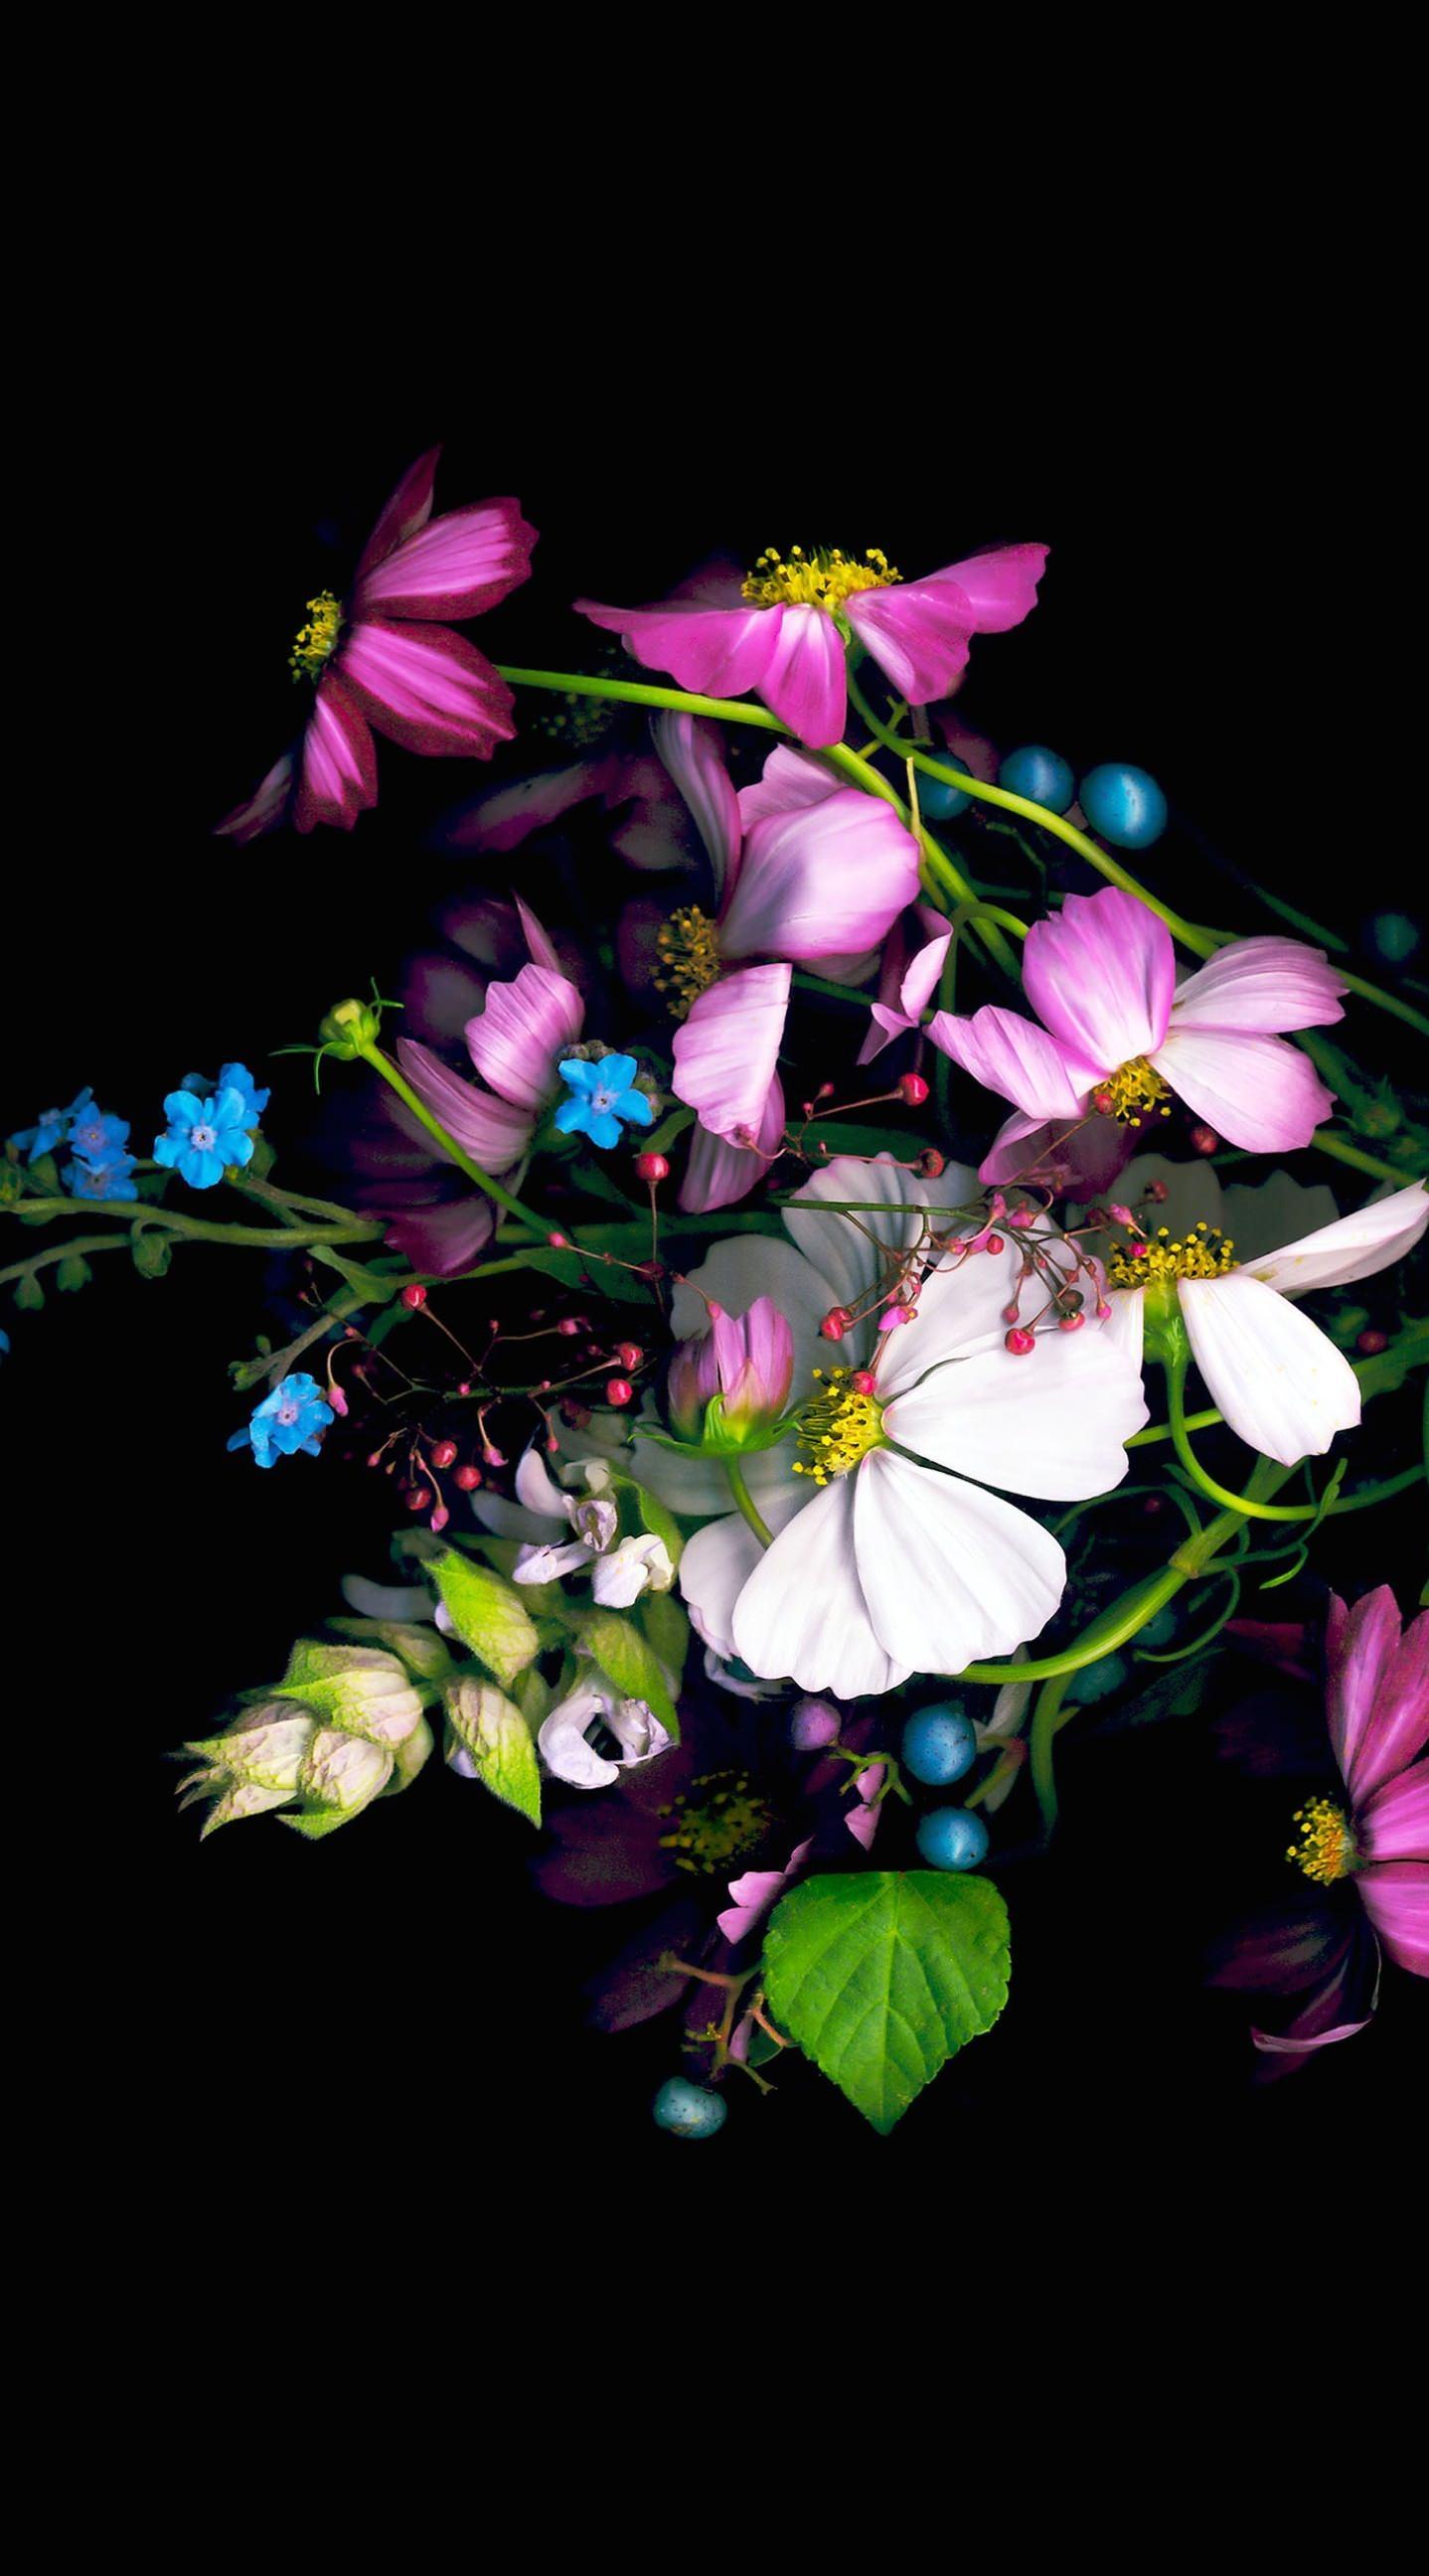 Background Bunga Hitam : background, bunga, hitam, Bunga, Hitam, Wallpapersc, Iphone6splus, Iphone, Wallpapers, Flowers, Black, 1438x2592, Download, Wallpaper, WallpaperTip